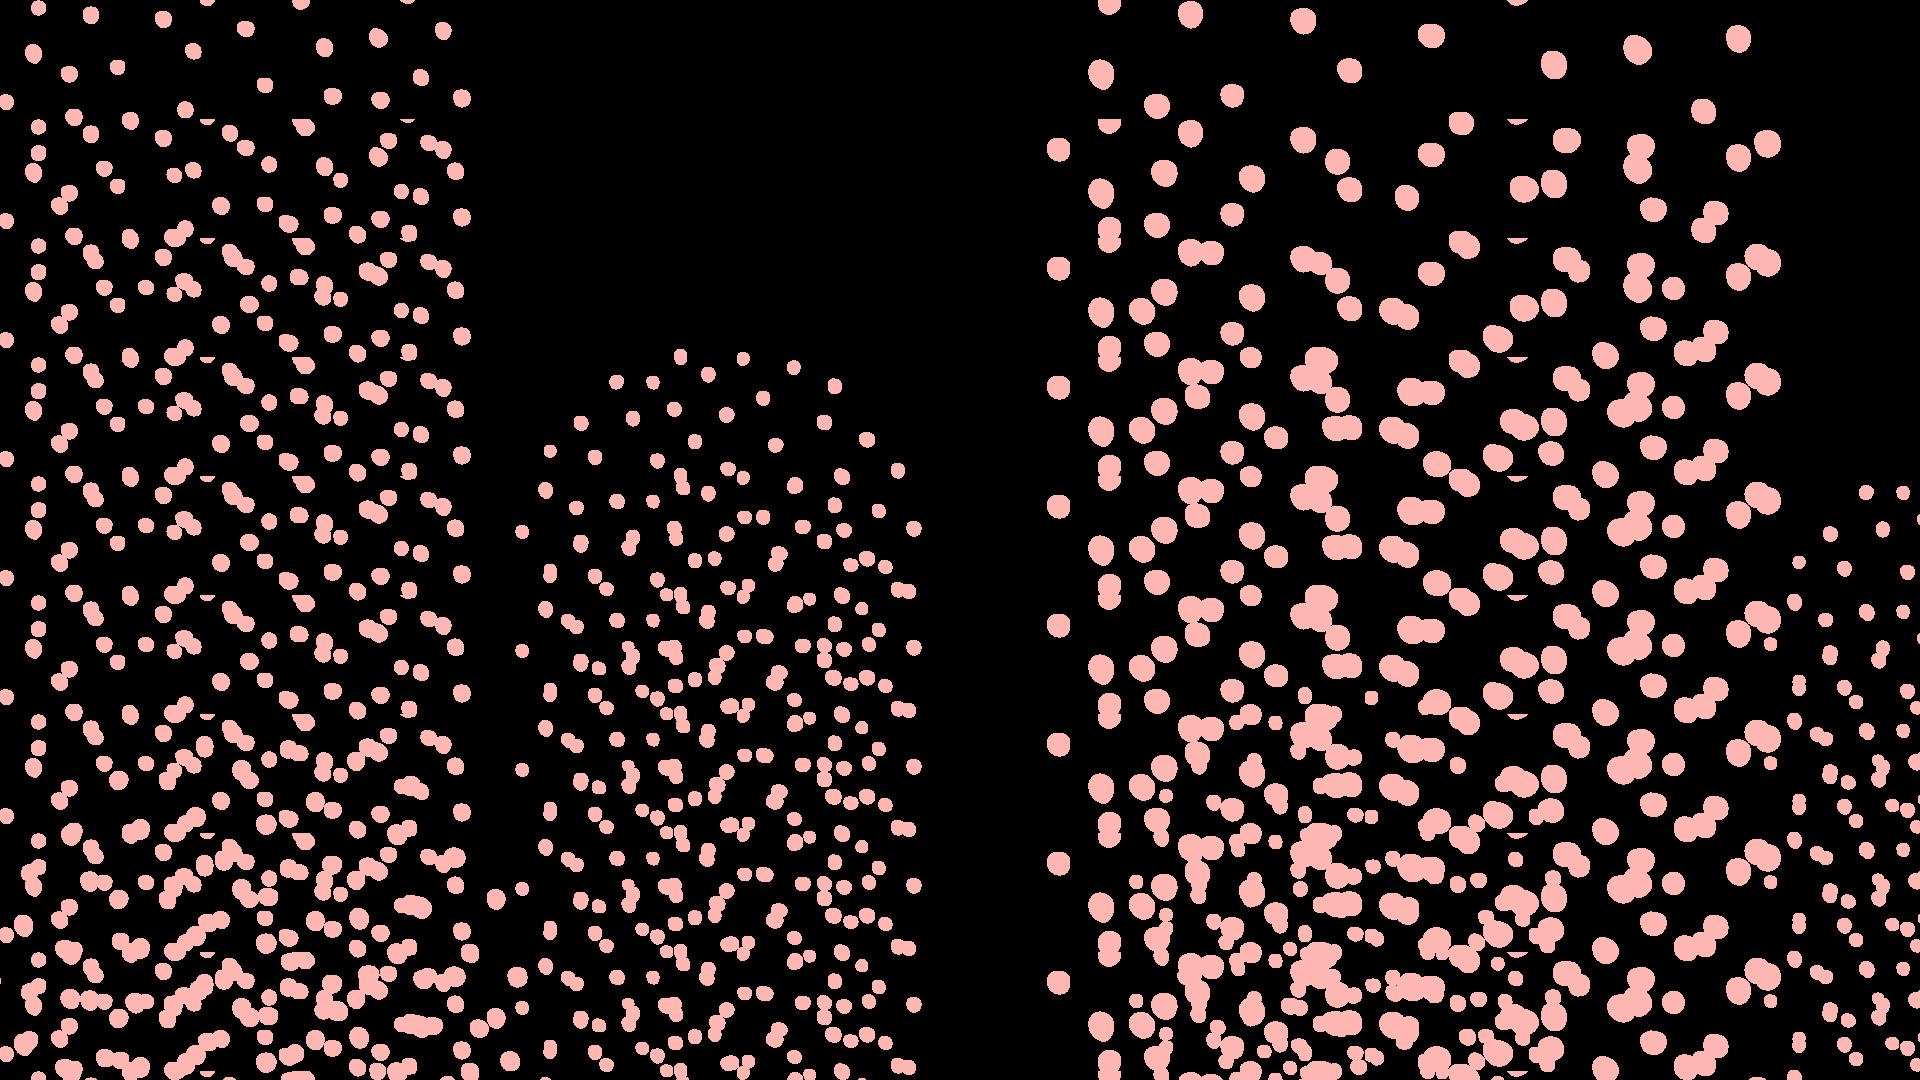 Pattern_DotCircles_Pink